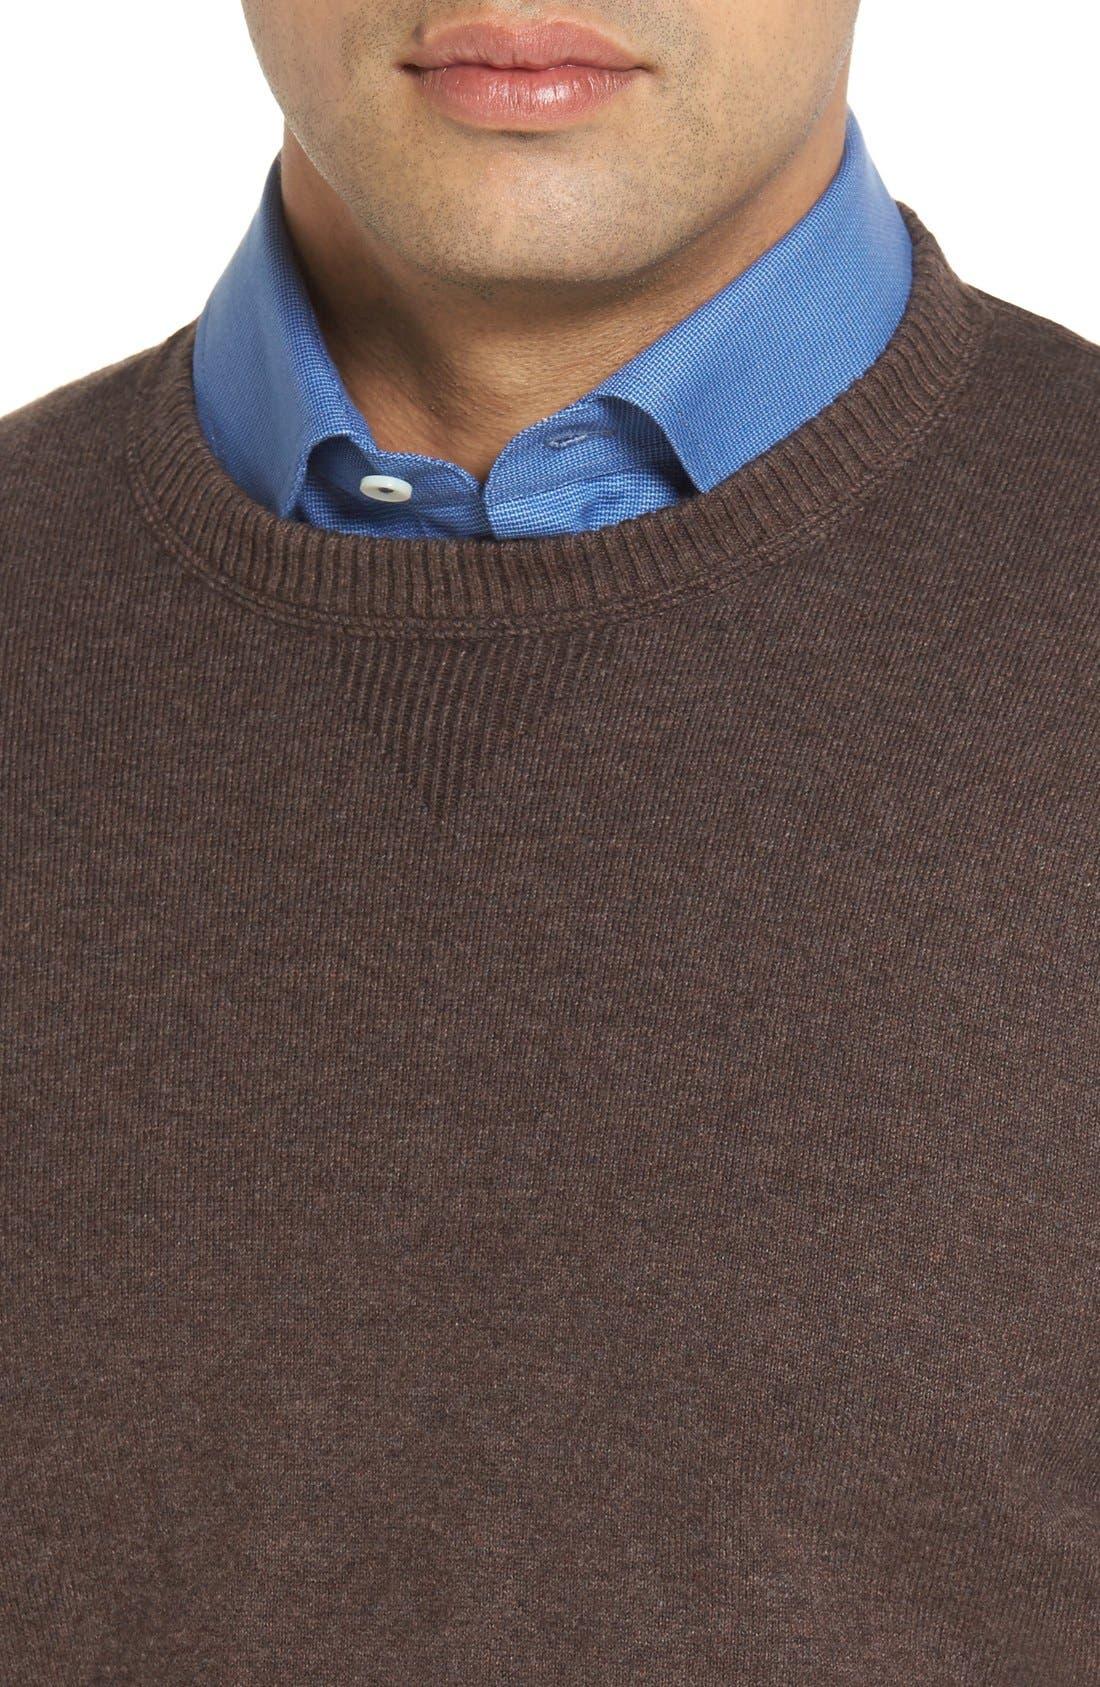 'Jersey Sport' Cotton Blend Crewneck Sweater,                             Alternate thumbnail 27, color,